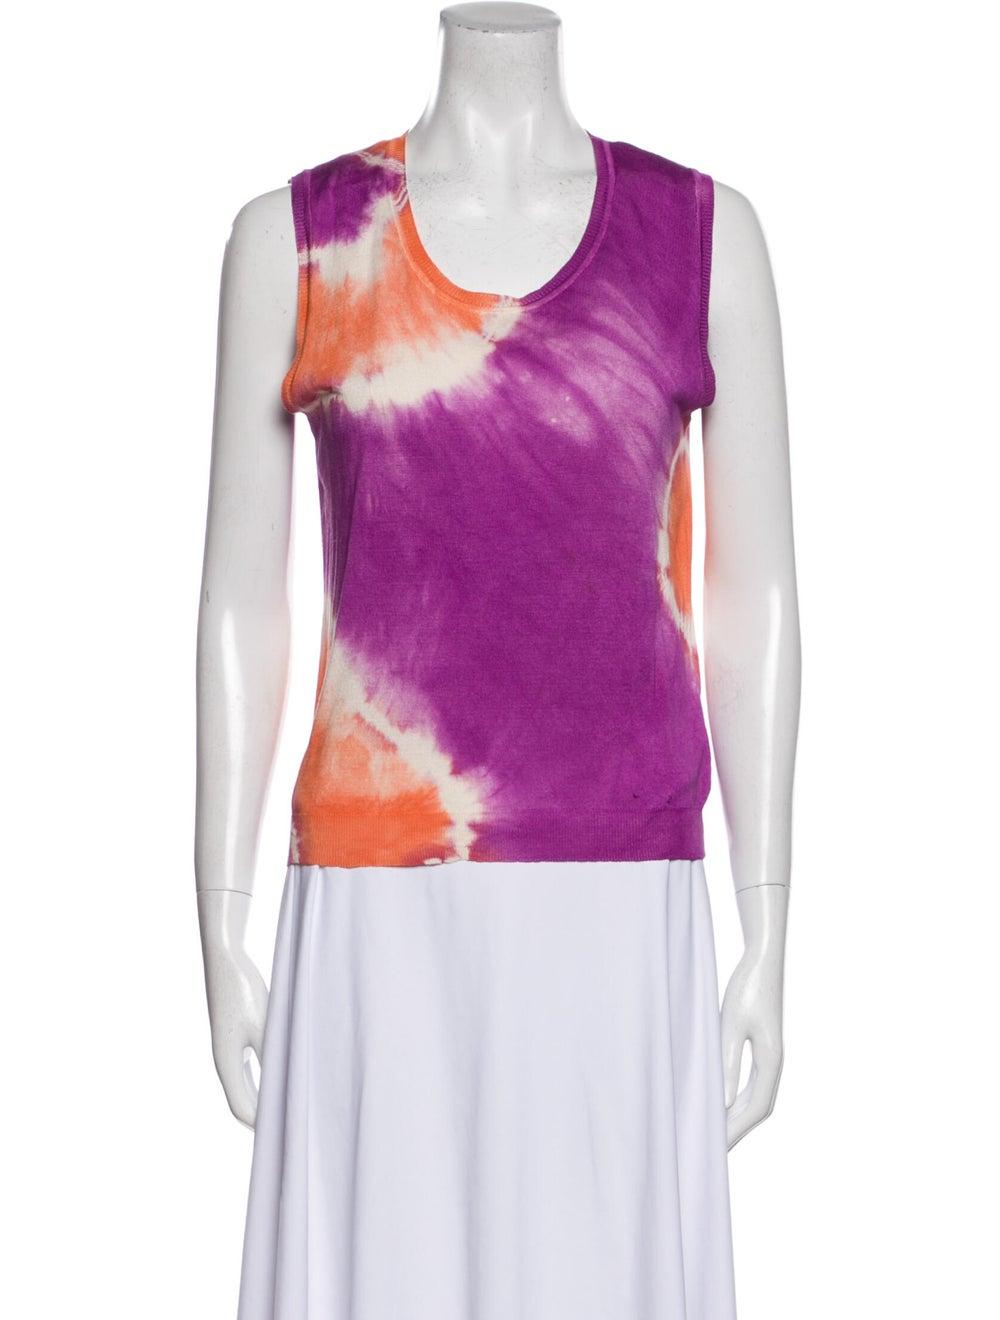 Blumarine Silk Tie-Dye Print Sweater Orange - image 4